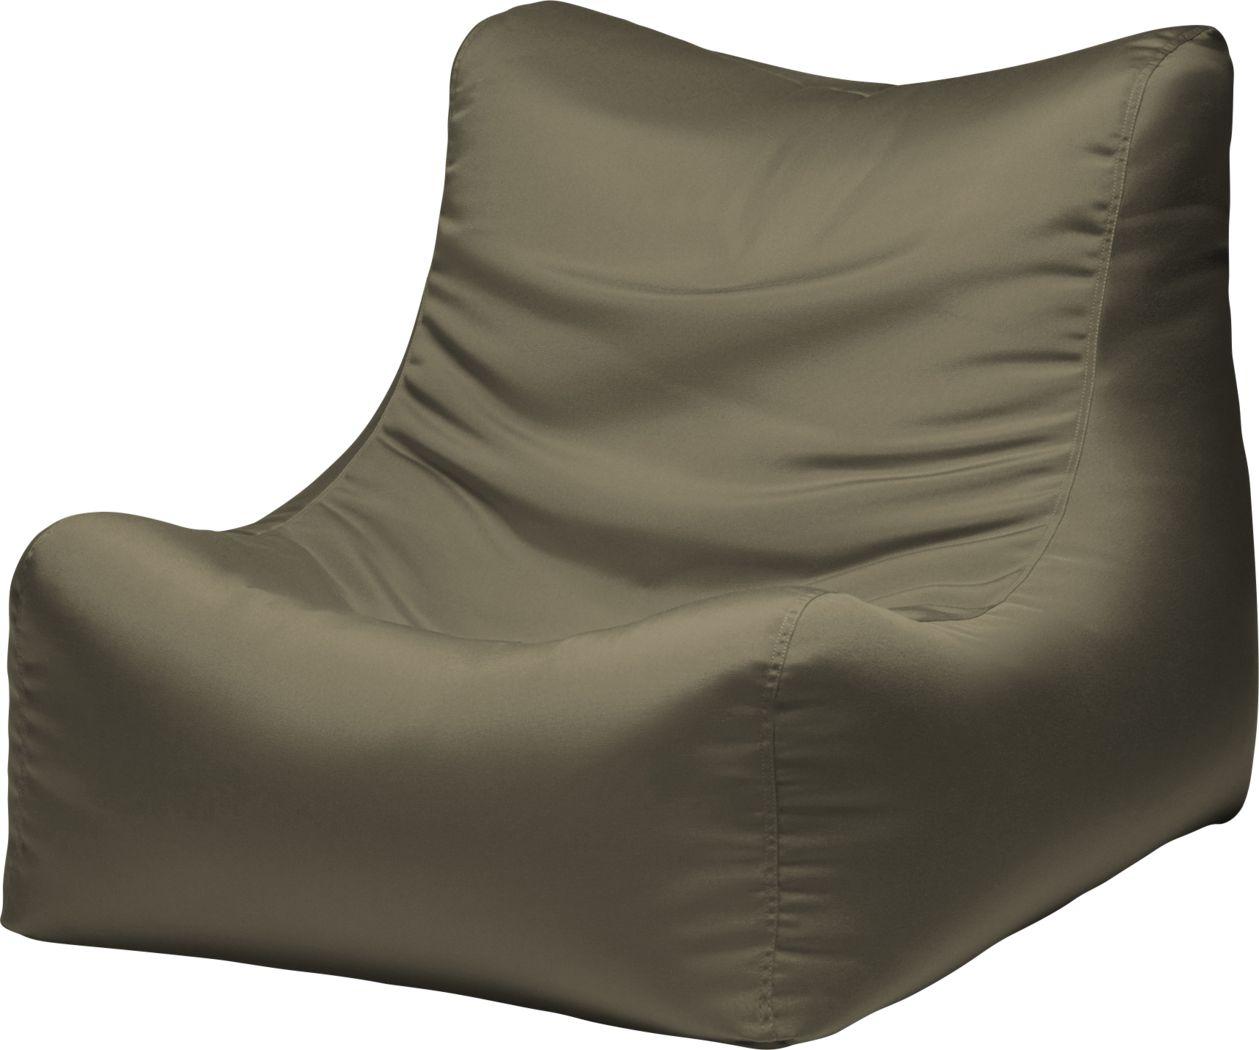 Kids Chatty Garden Taupe Indoor/Outdoor Bean Bag Chair